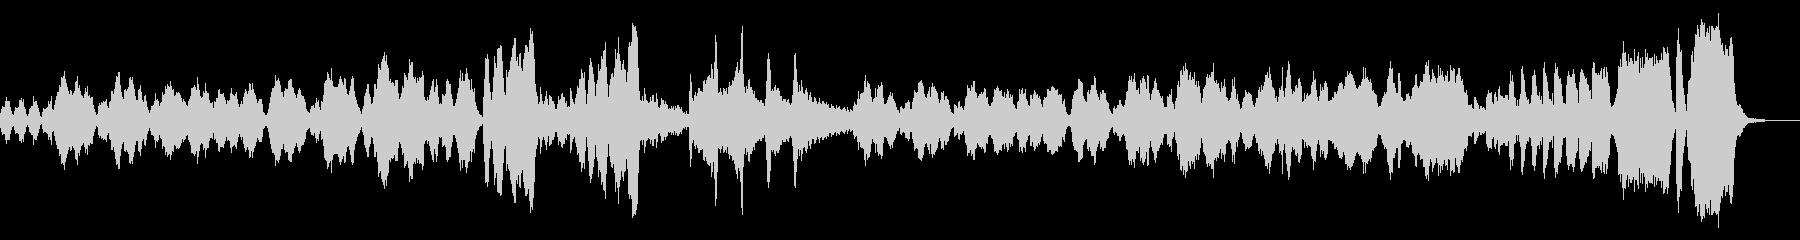 Waltz from Coppelia's unreproduced waveform